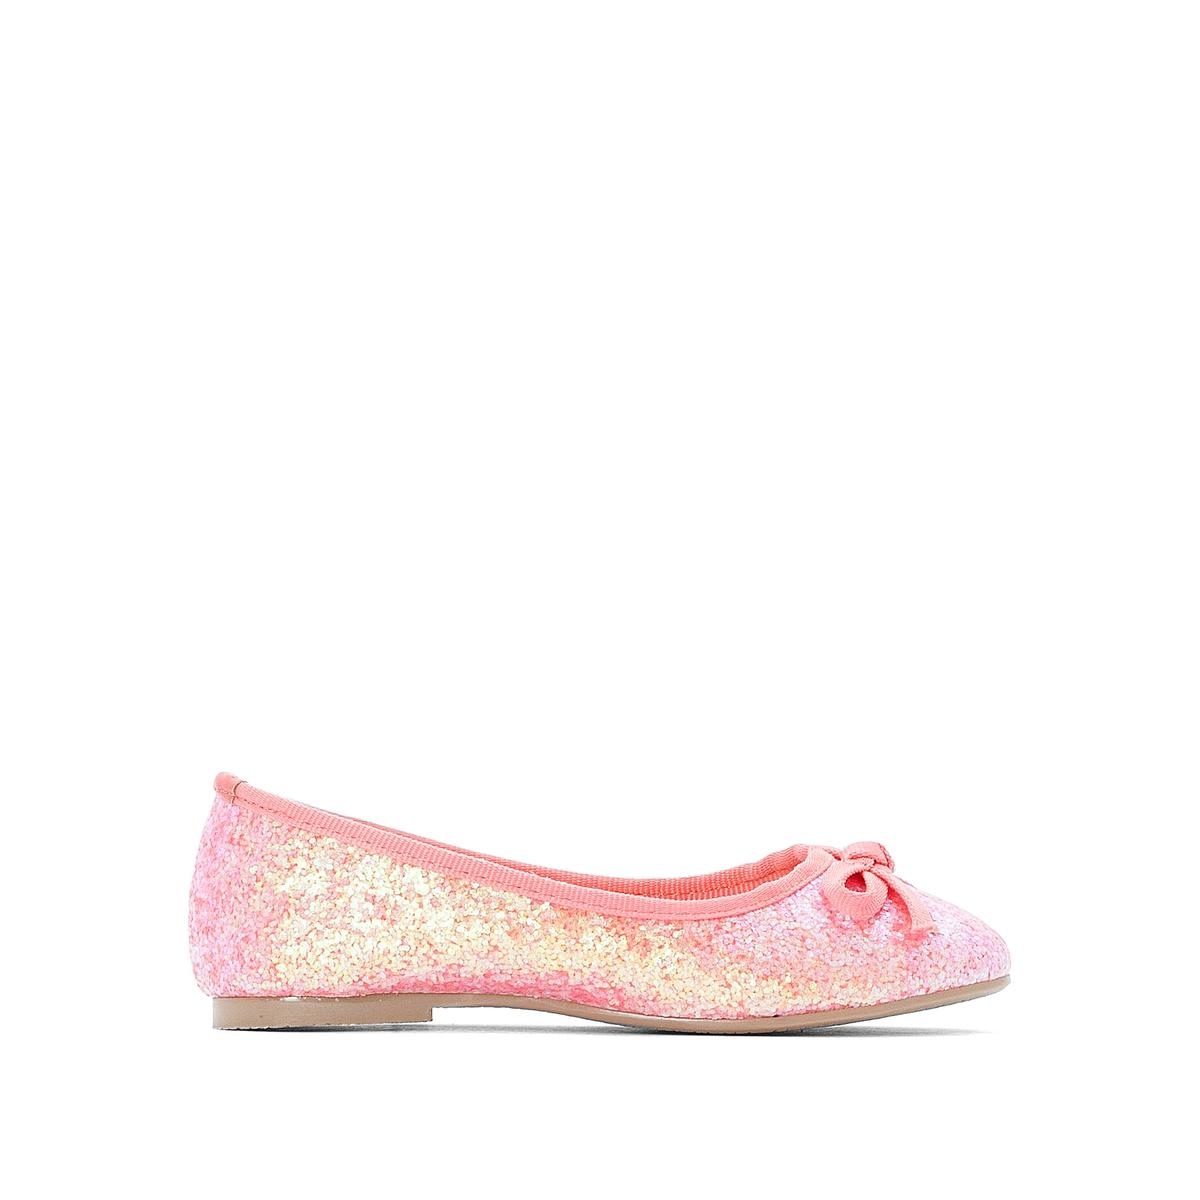 цена Балетки La Redoute С блестками размеры - 34 розовый онлайн в 2017 году